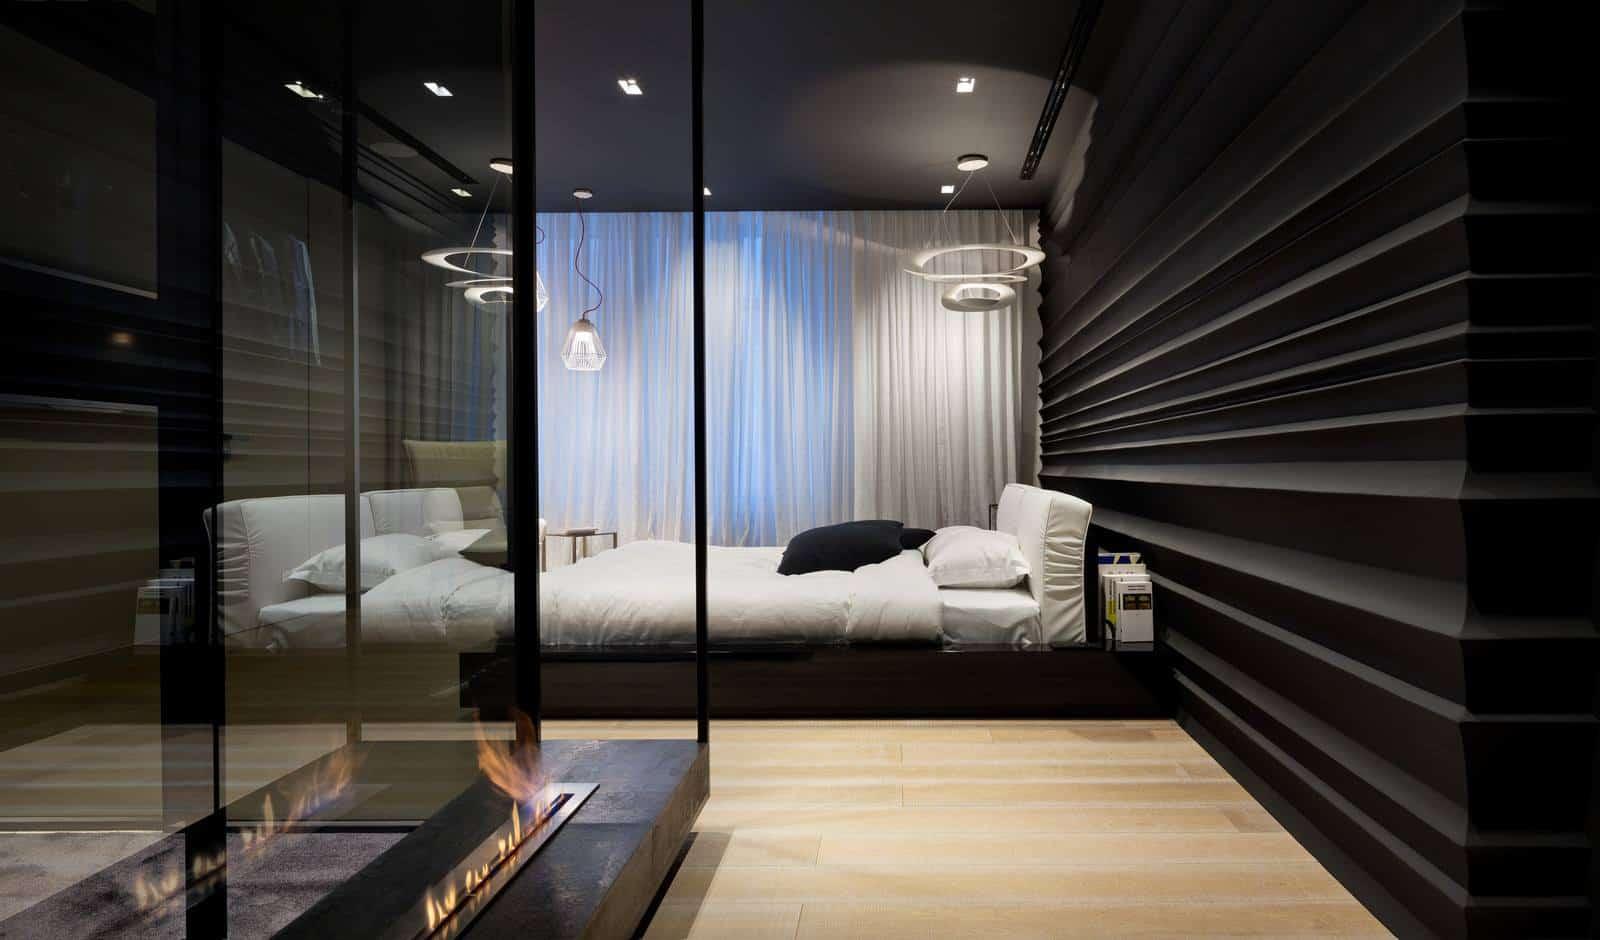 thiet-ke-noi-that-chung-cu-mai-dich-15 Thiết kế nội thất chung cư Mai Dịch - A. Sinh